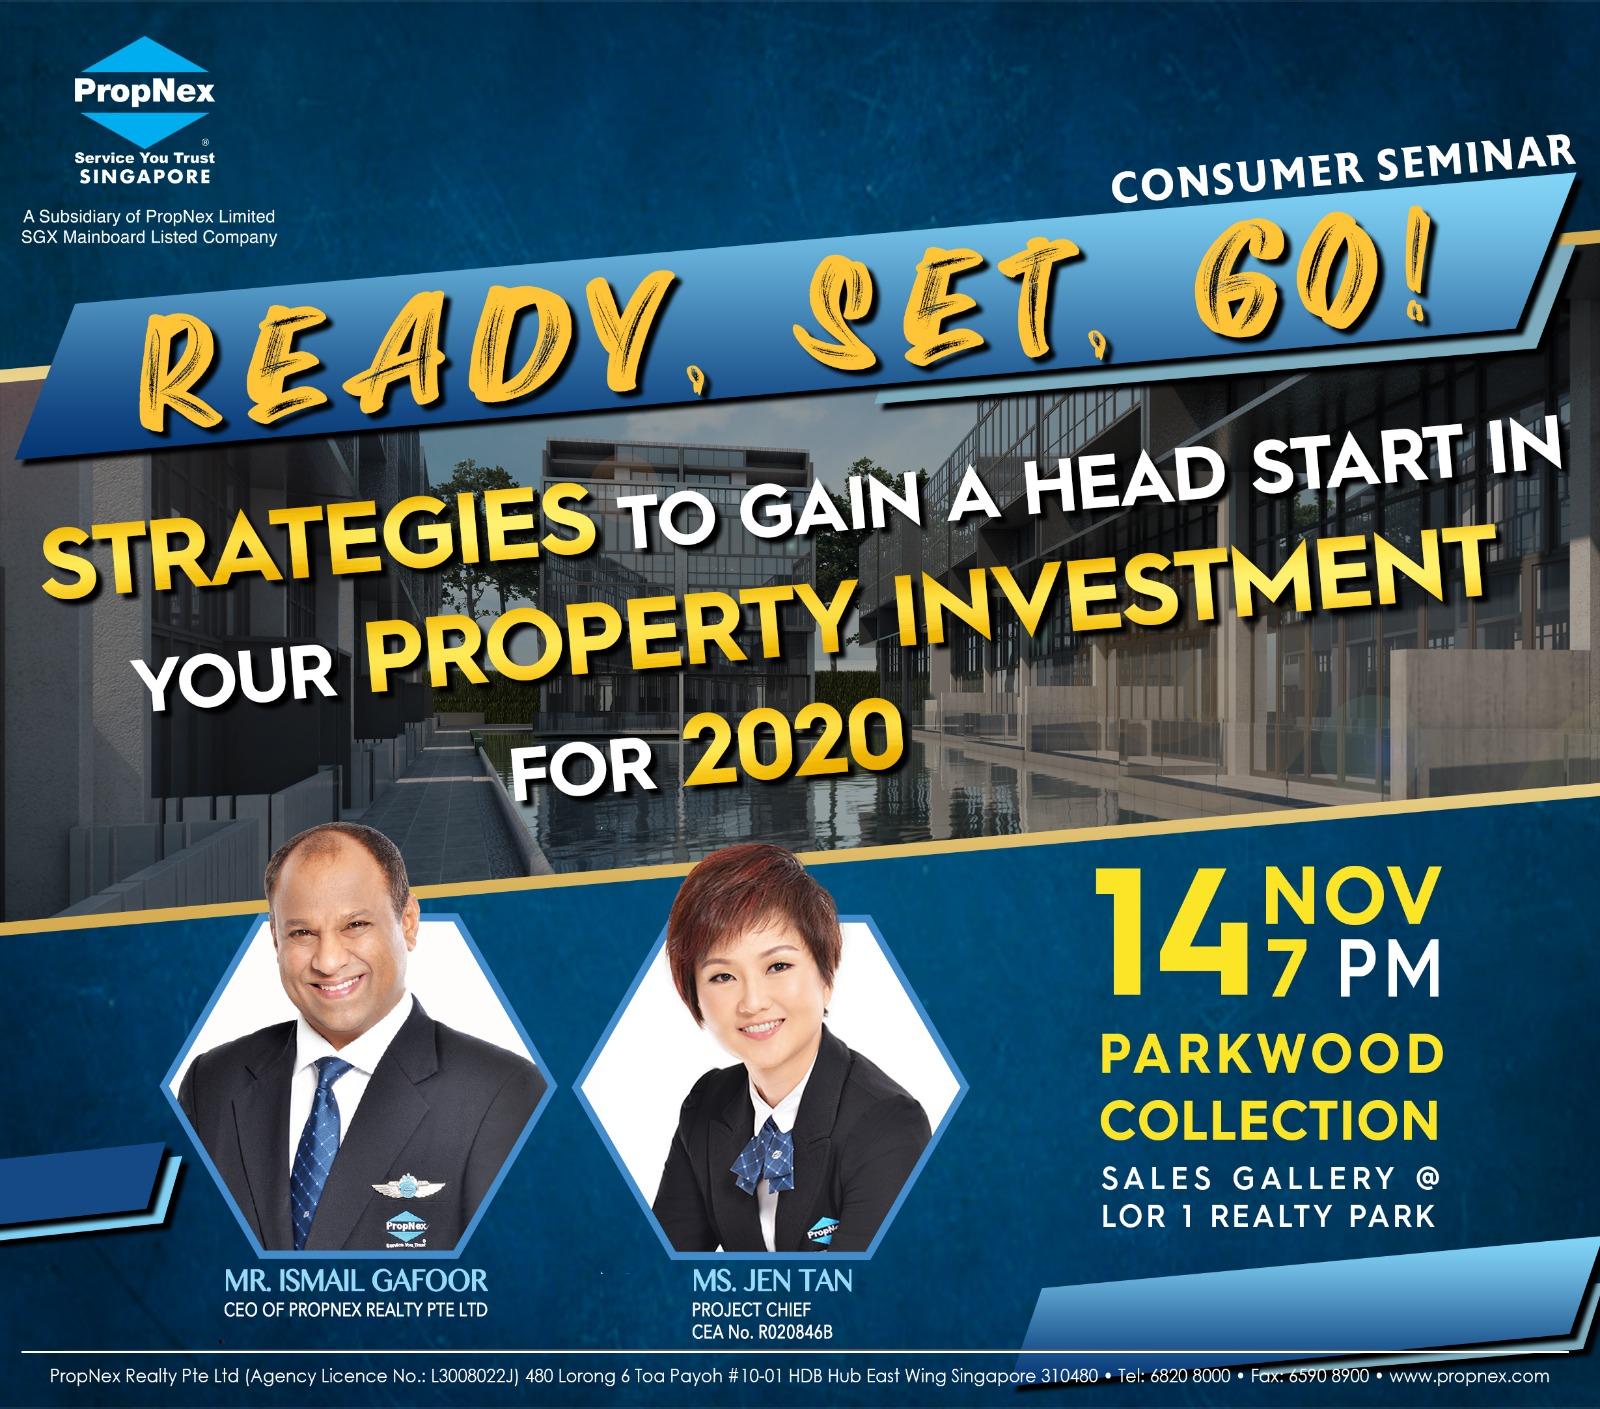 Singapore Real Estate | Property | Retirement Planning | Jen Tan | Consumer Seminar | Parkwood Collection